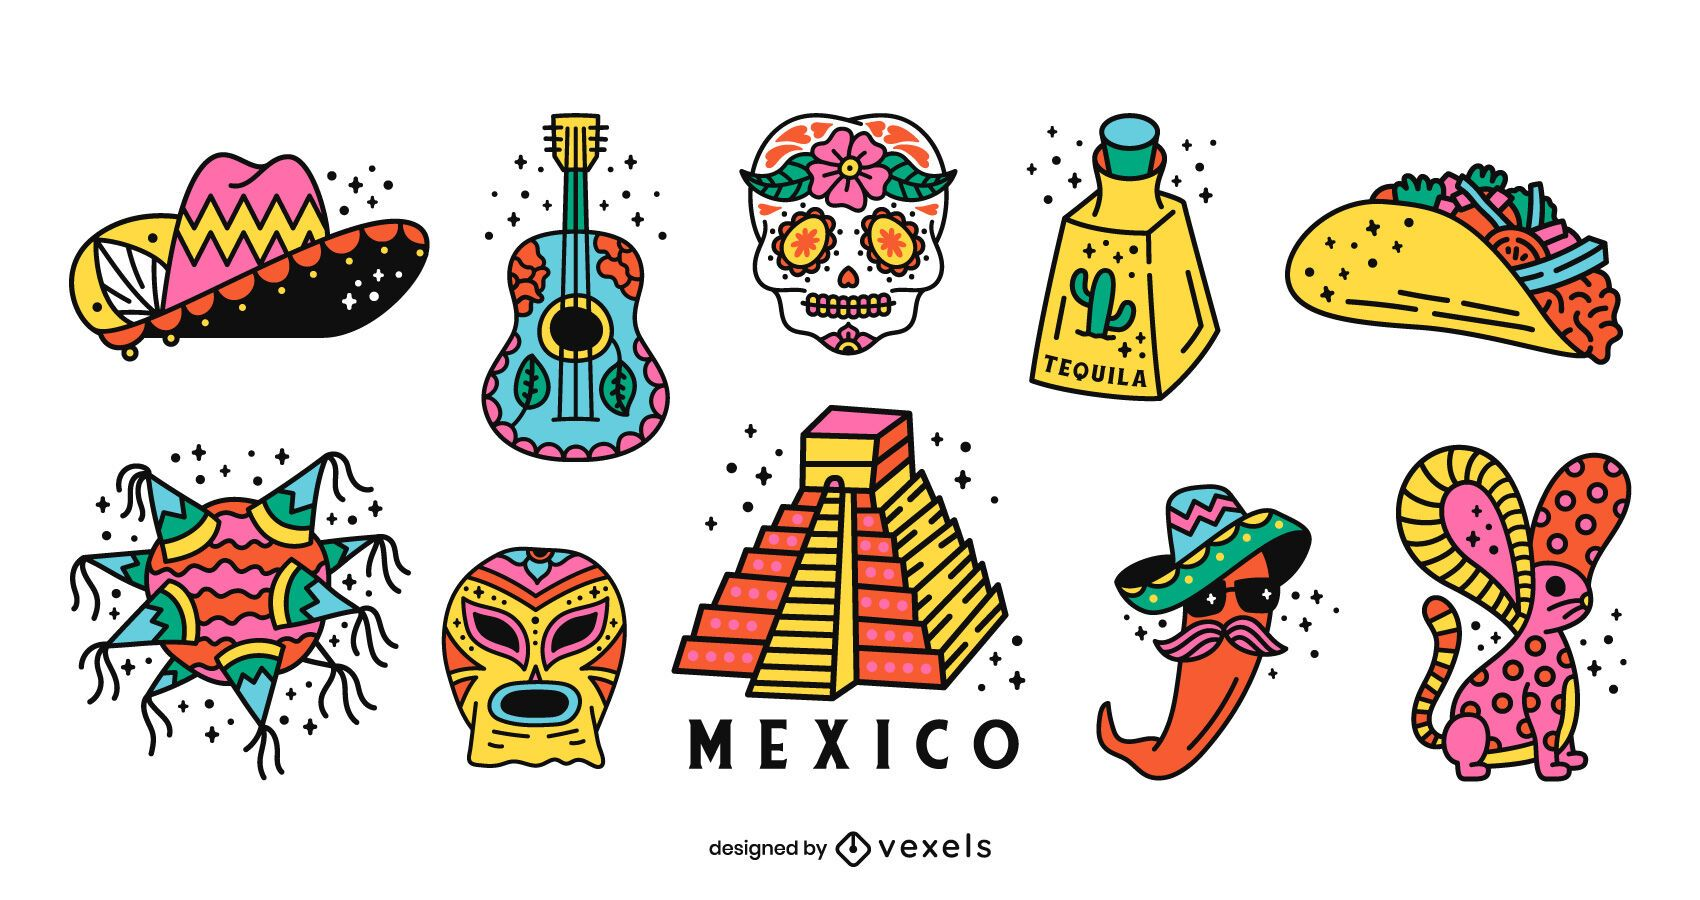 Pacote de design colorido do Mexico Elements